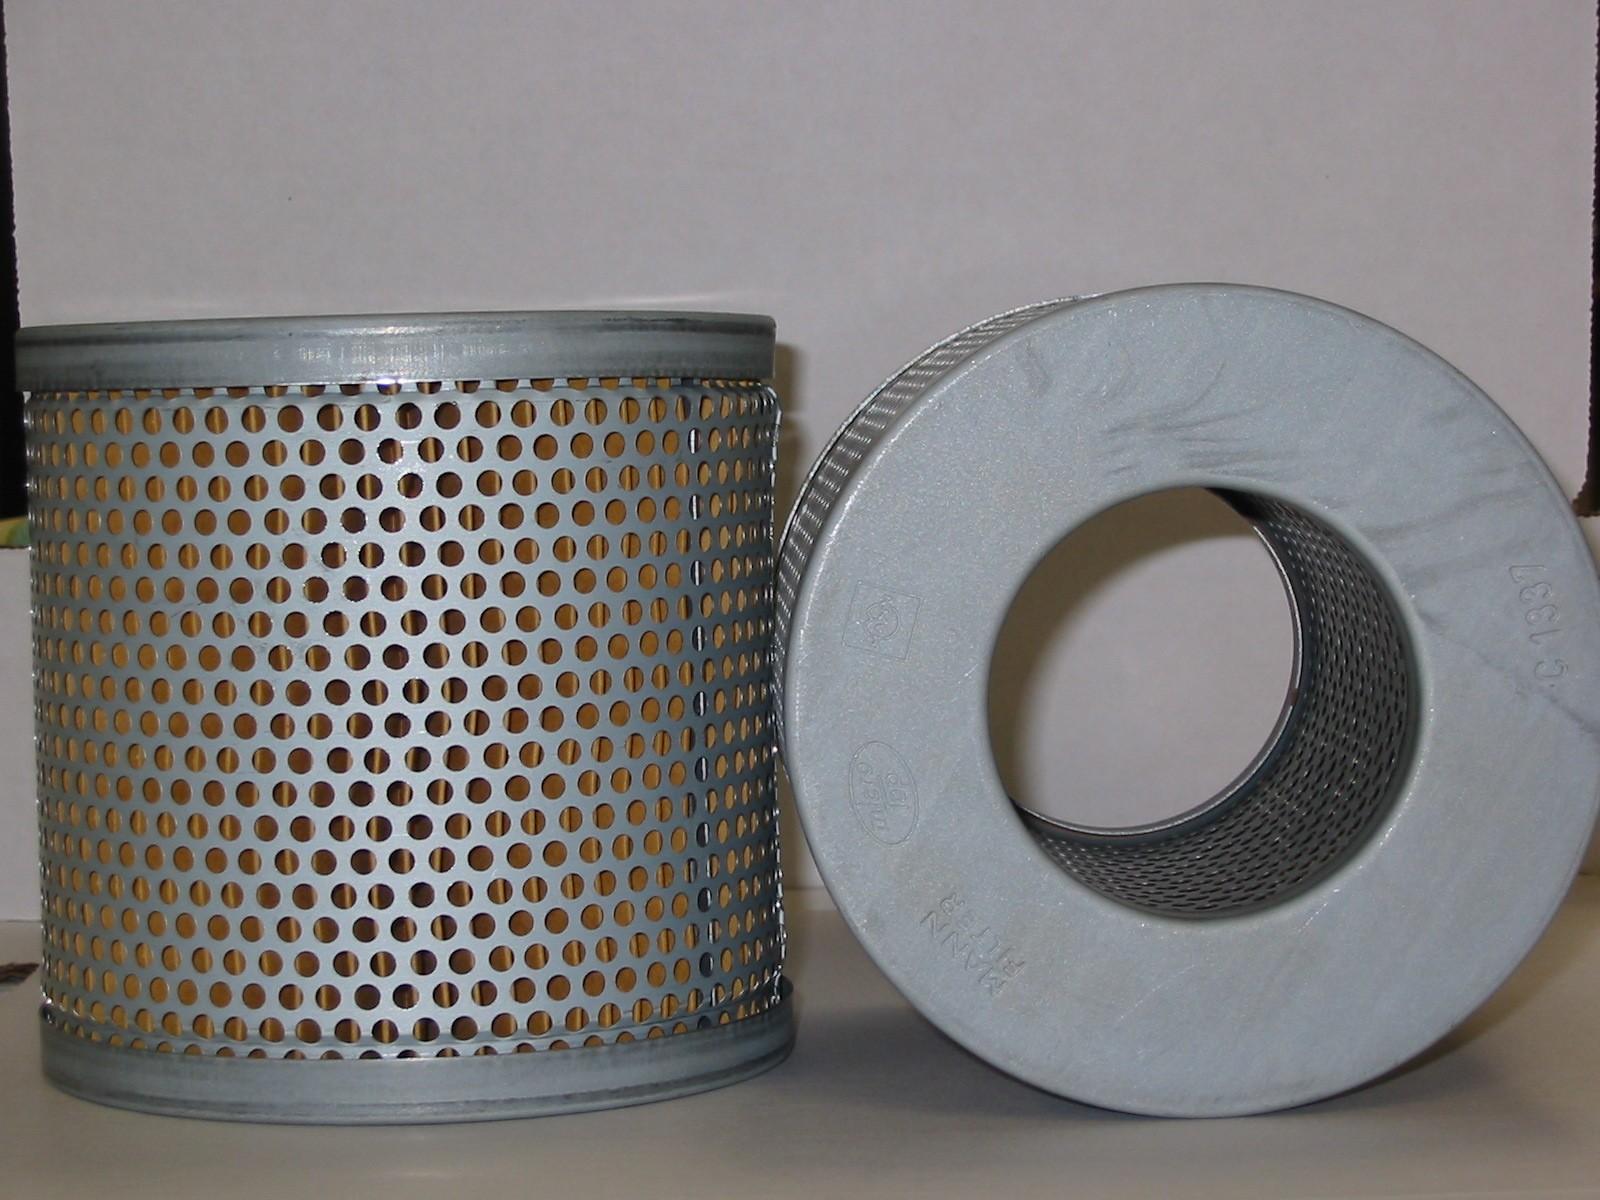 Becker Replacement 84040207 Filter Control Specialties